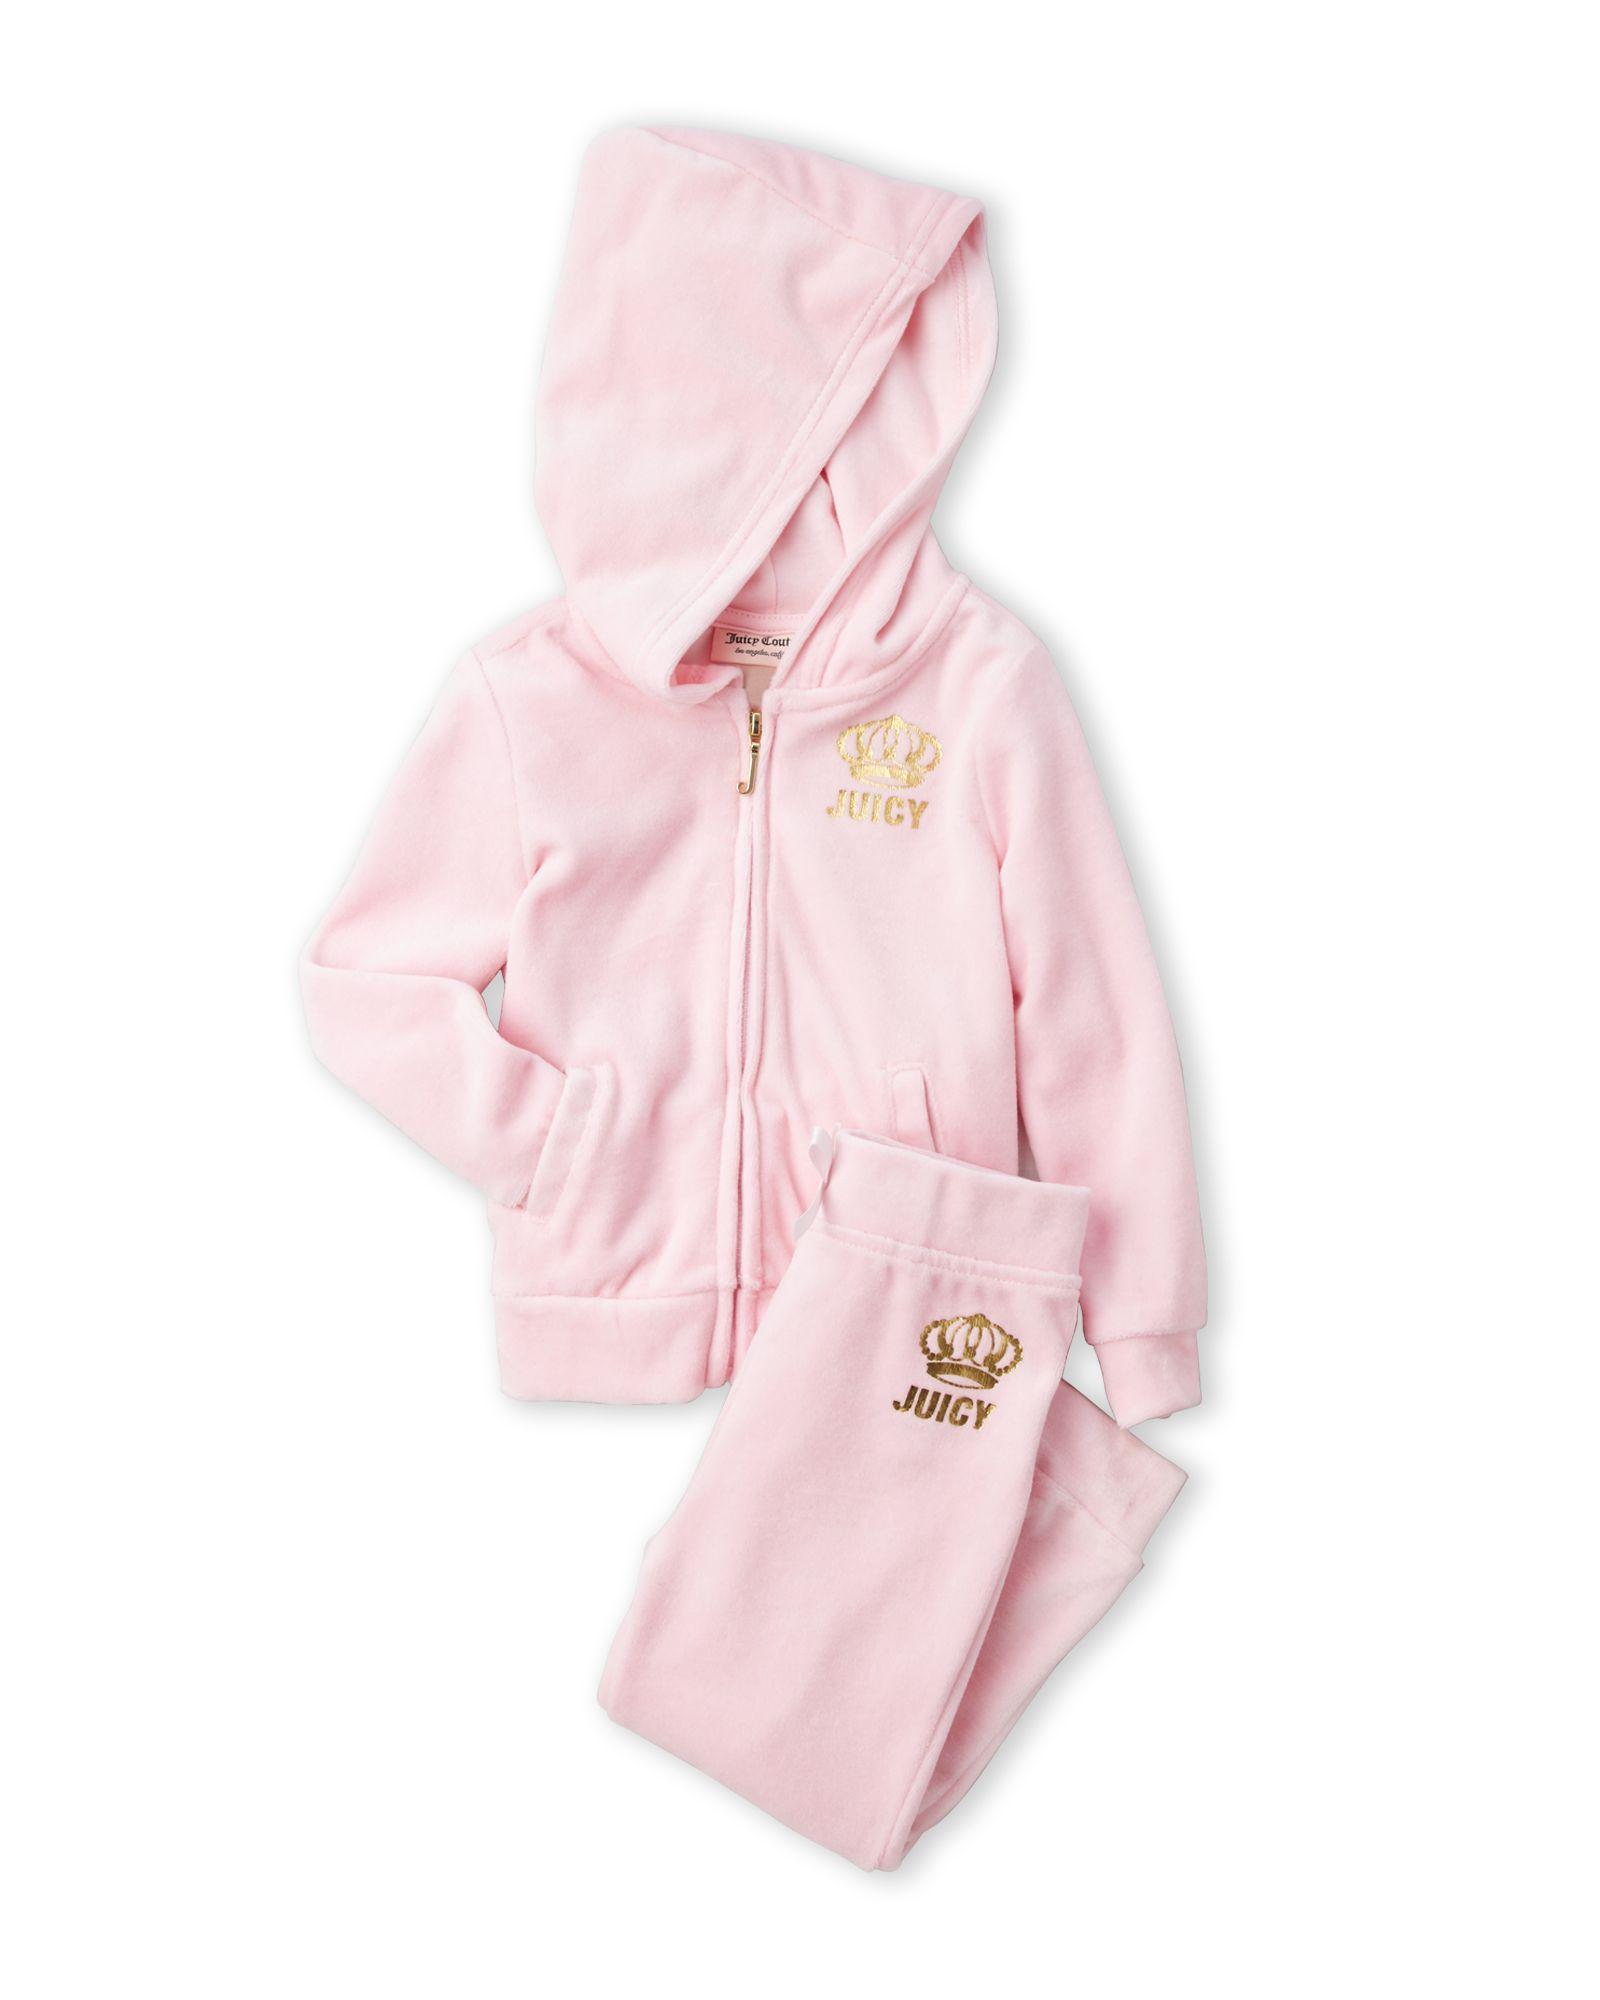 56b2b900c Juicy Couture (Infant Girls) Two-Piece Light Pink Velour Jogging Suit